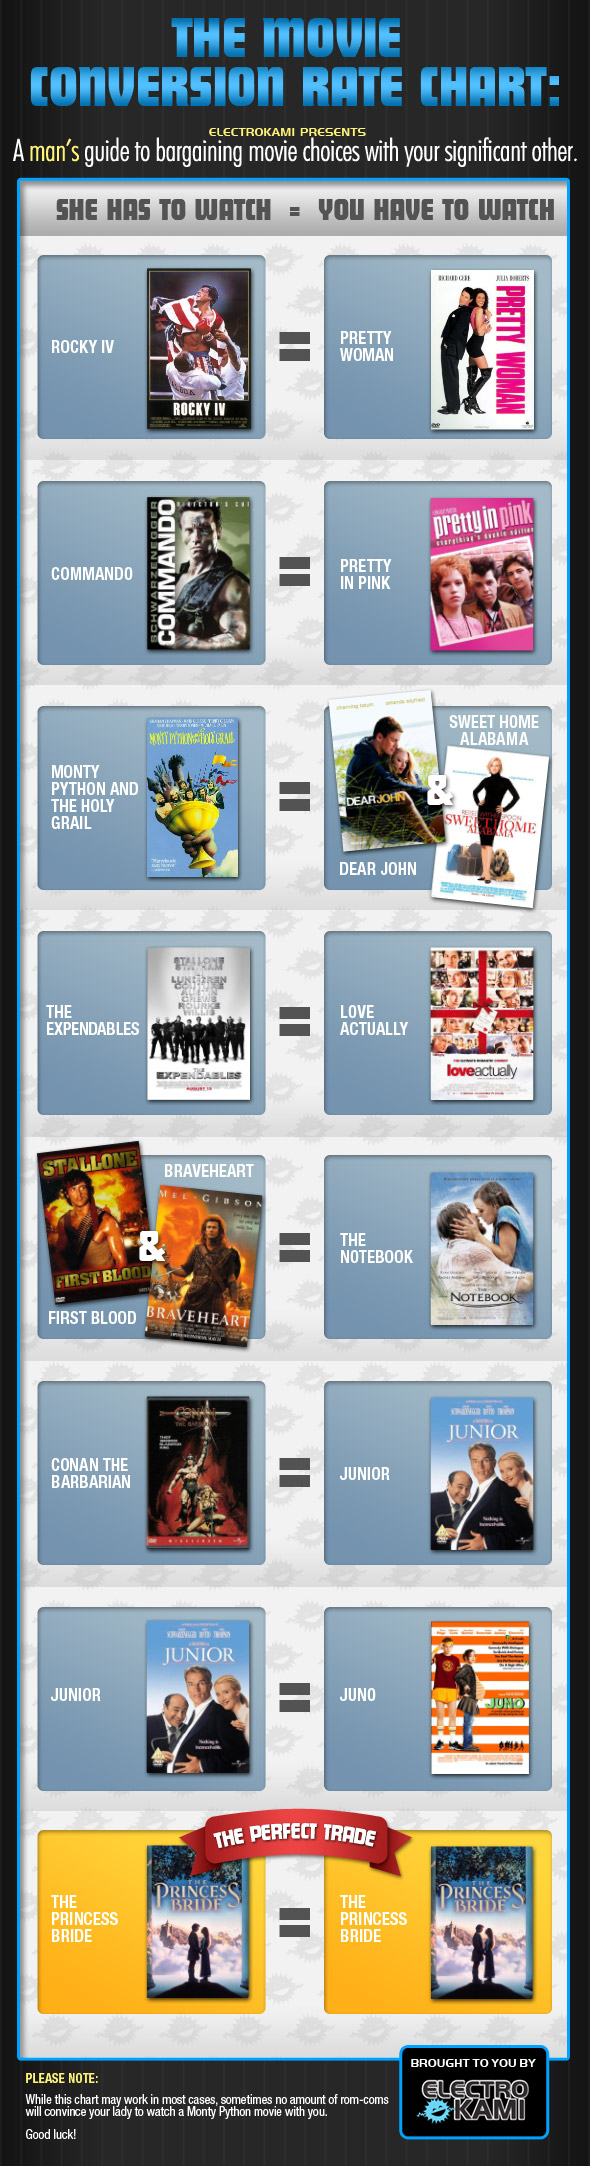 movie conversion chart electro kami